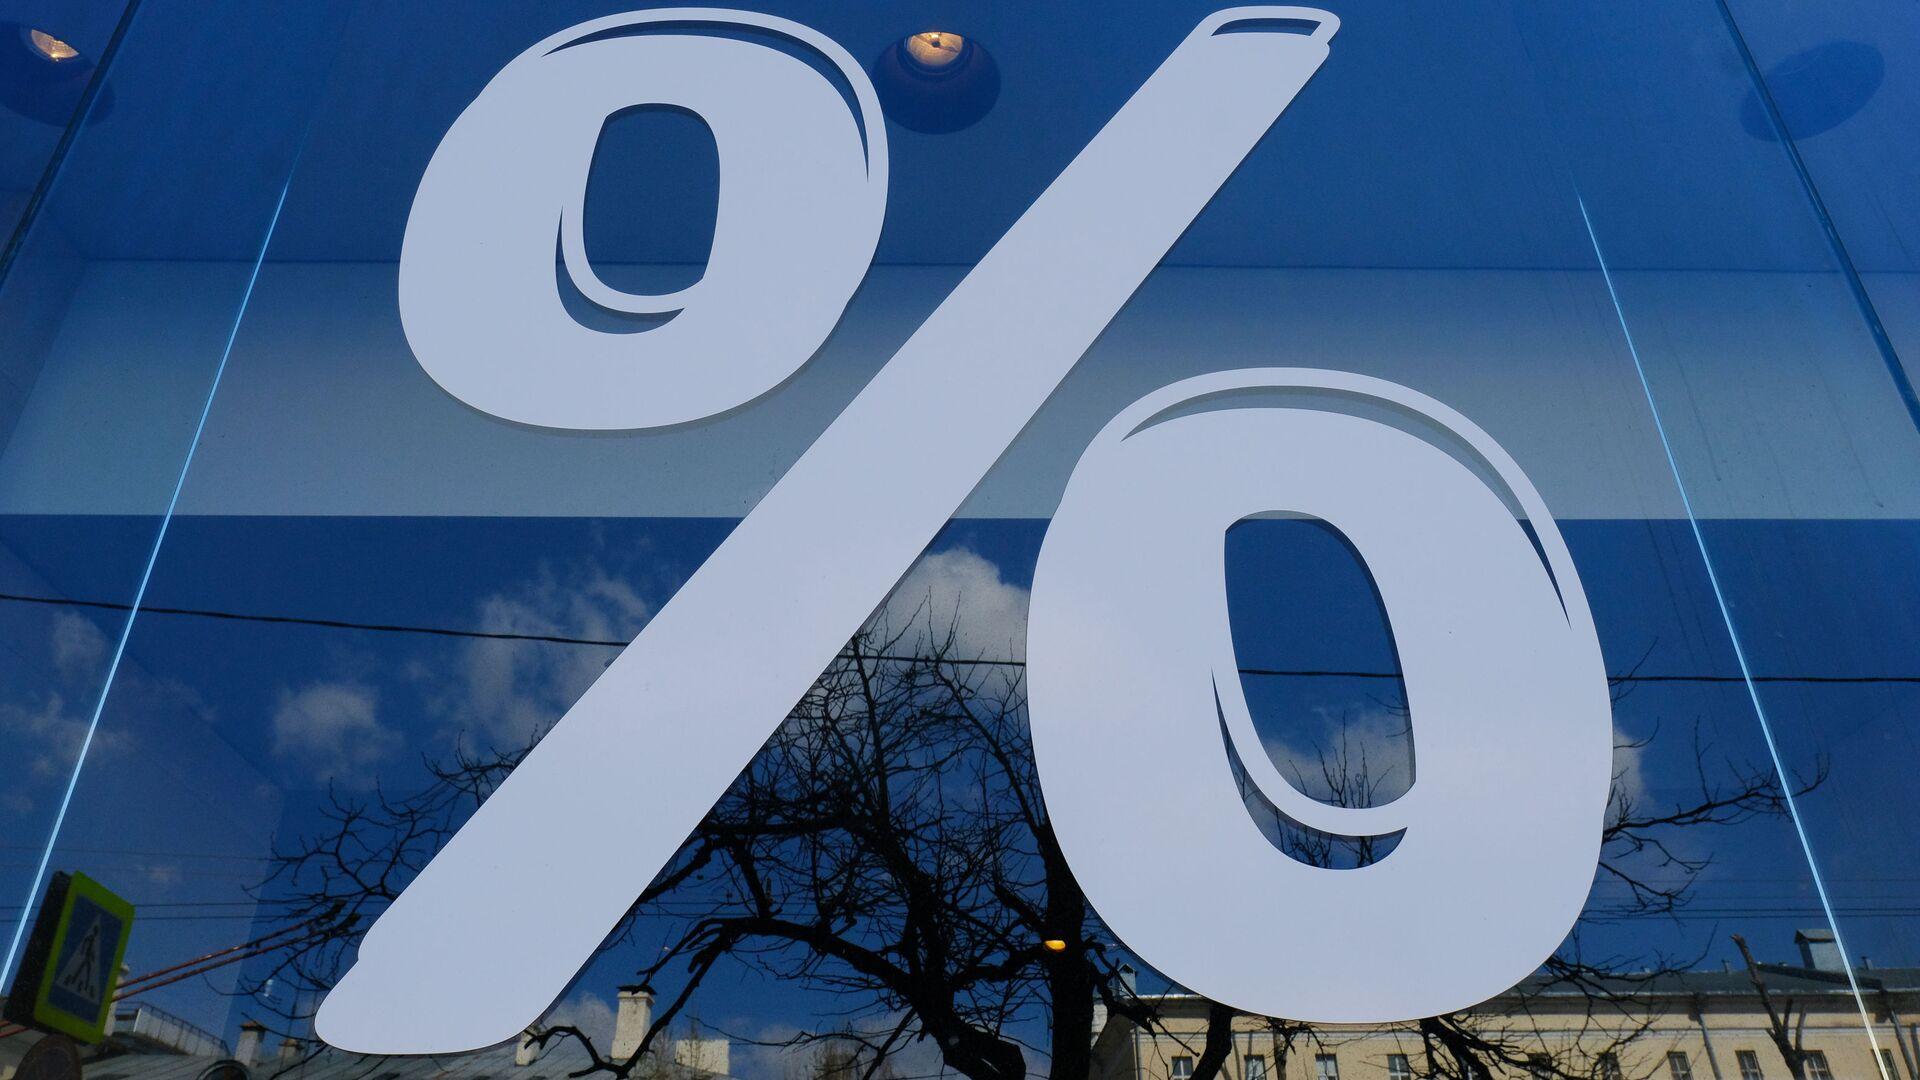 Знак процента в витрине - РИА Новости, 1920, 01.03.2021